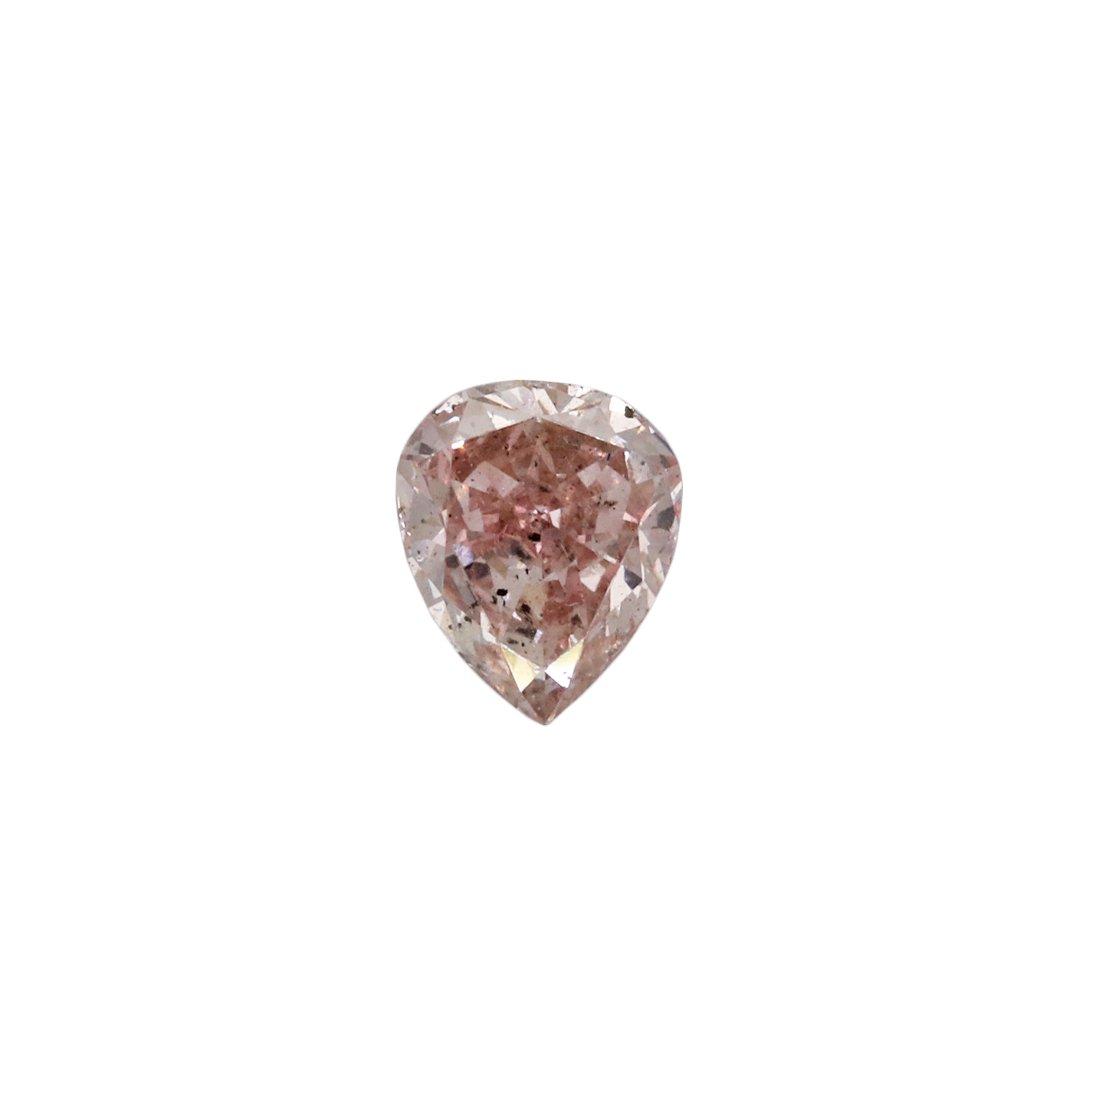 0.21ct Natural Fancy Pink, 6PR, SI2, Argyle Pink Diamond